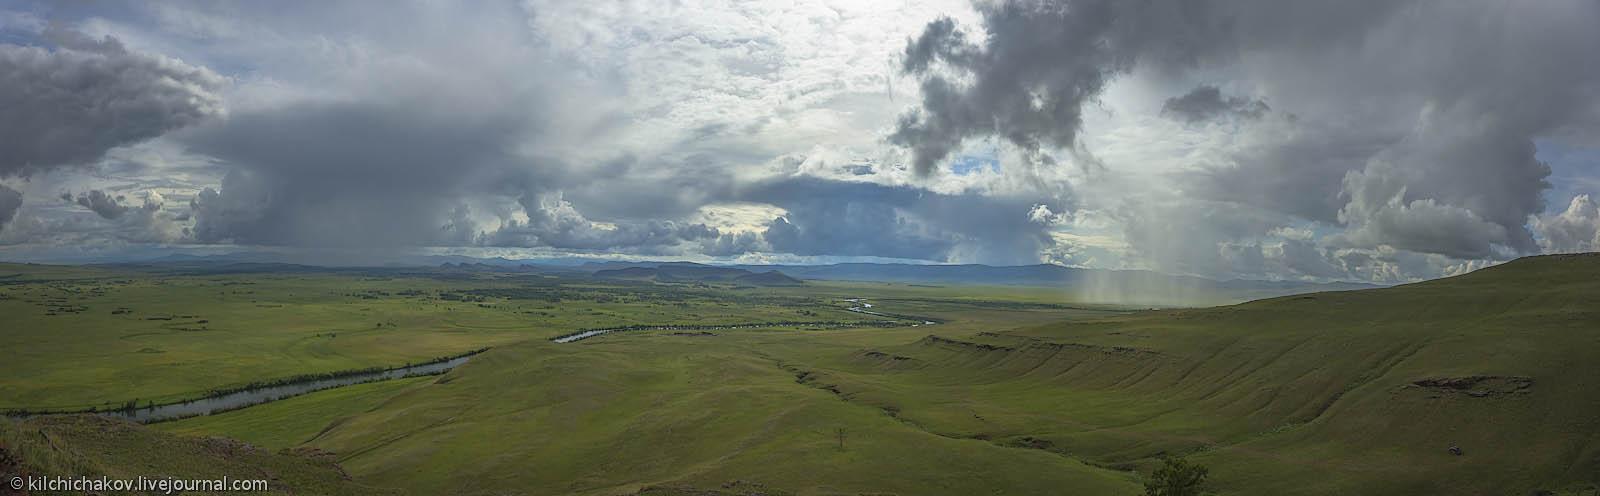 DSC02092 Panorama copy